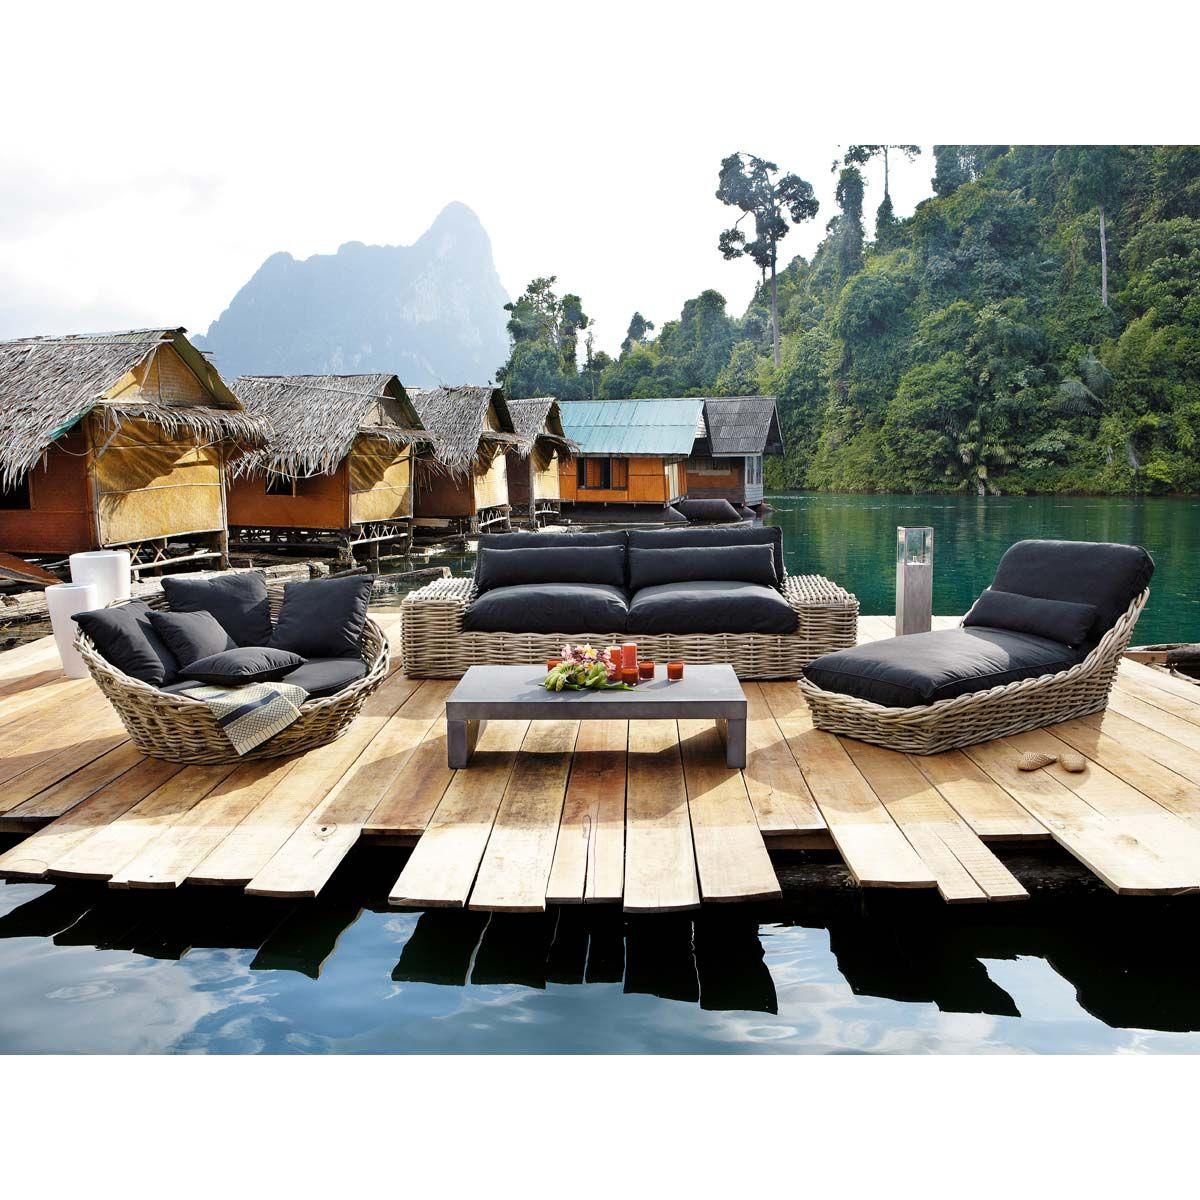 Outdoor Furniture In 2020 | Outdoor Furniture Sets, Outdoor ... à Salon De Jardin Maison Du Monde